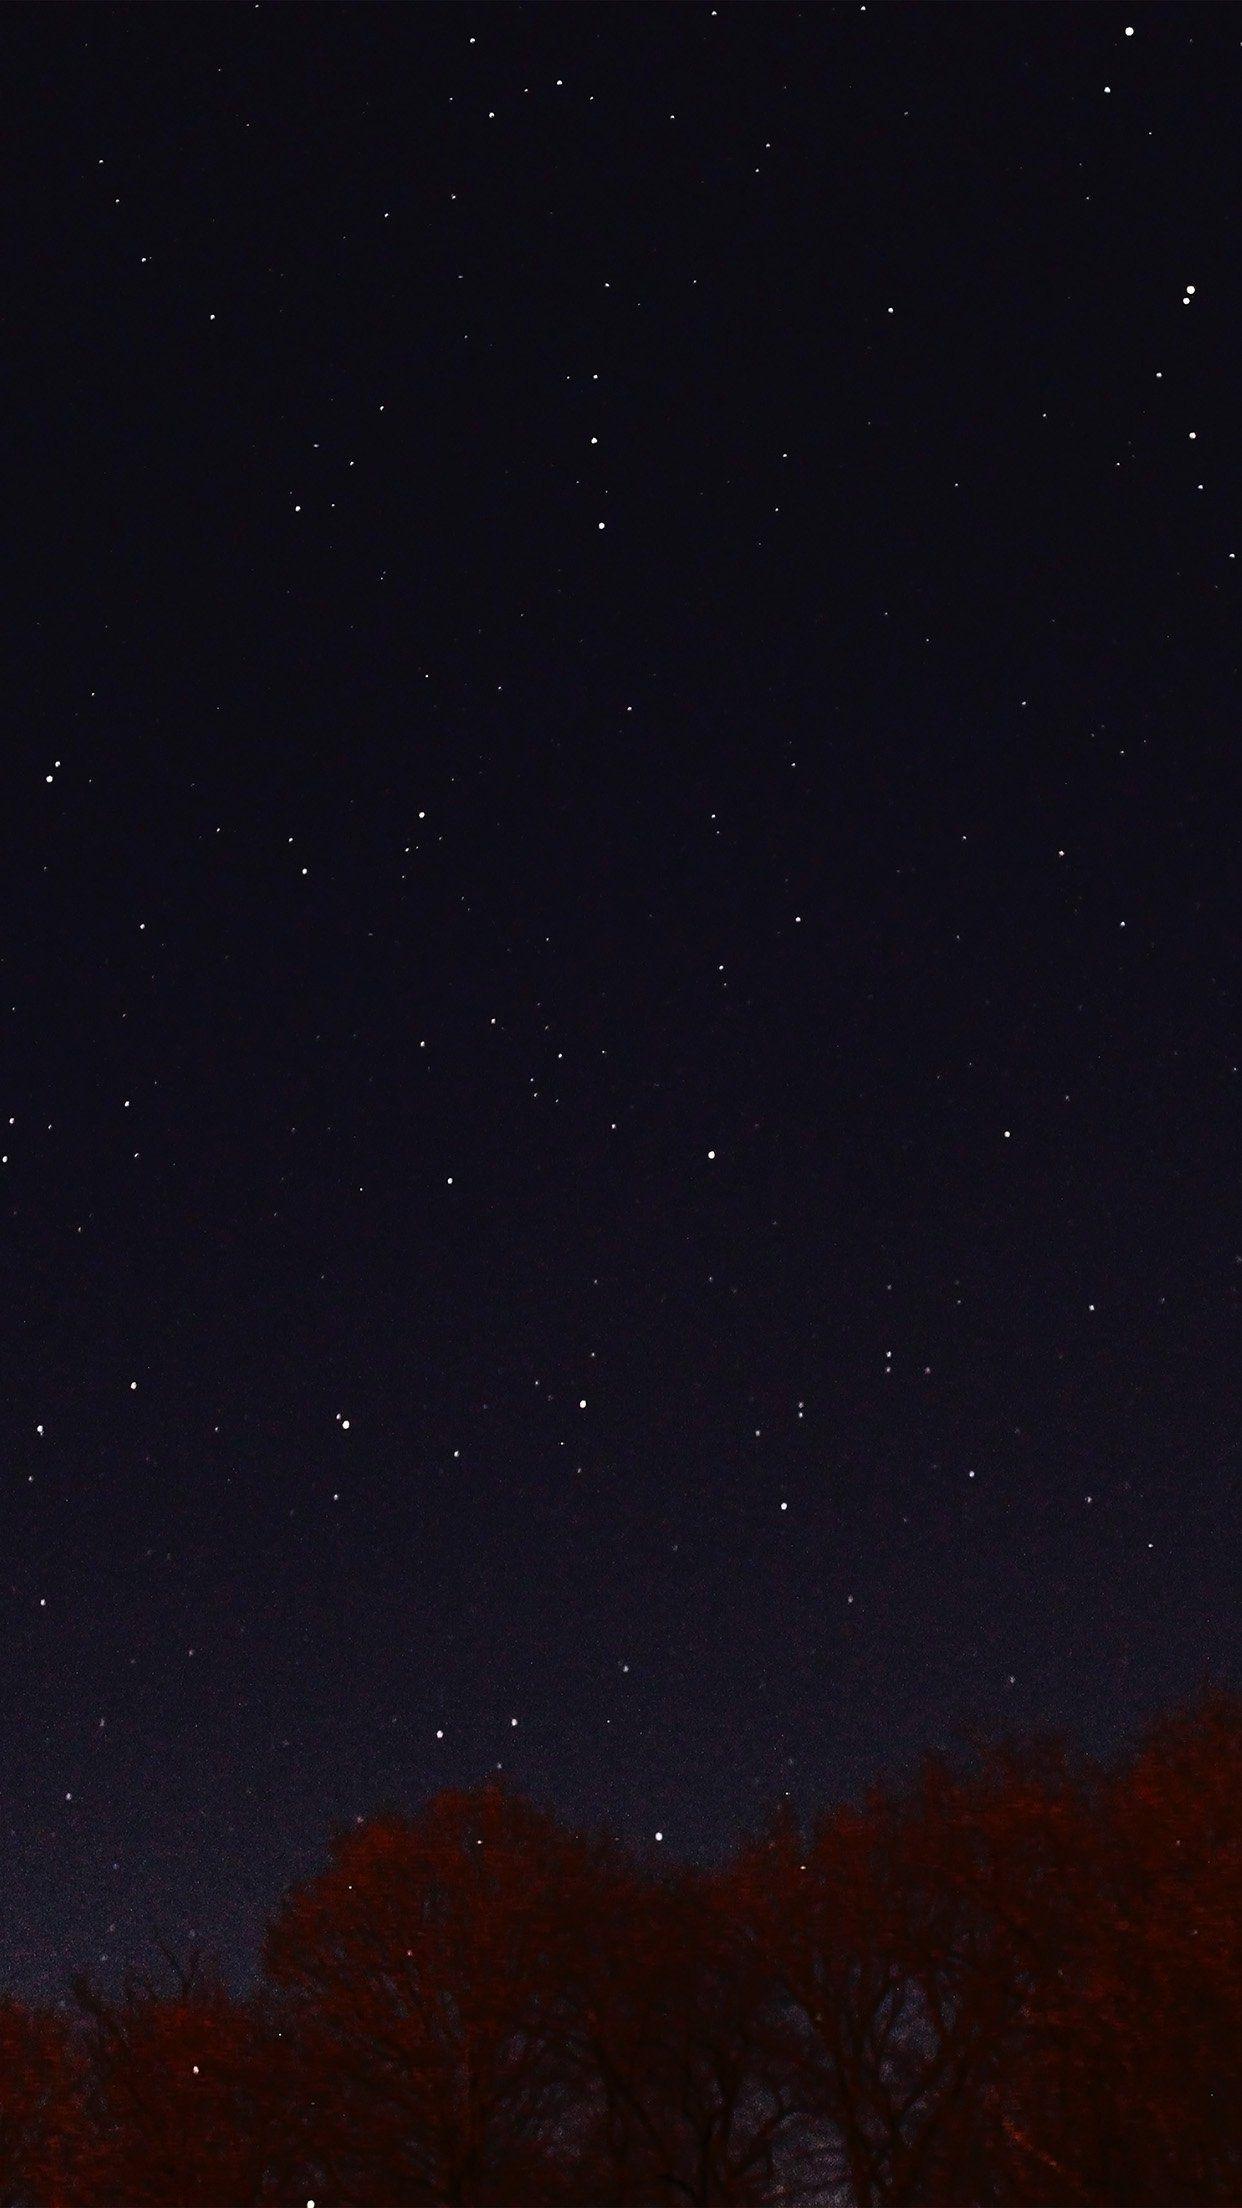 Night Sky Dark Star Lights Tree Nature Iphone 6 Wallpaper Download Iphone Wallpapers Dark Background Wallpaper Tree Nature Wallpaper Space Iphone Wallpaper